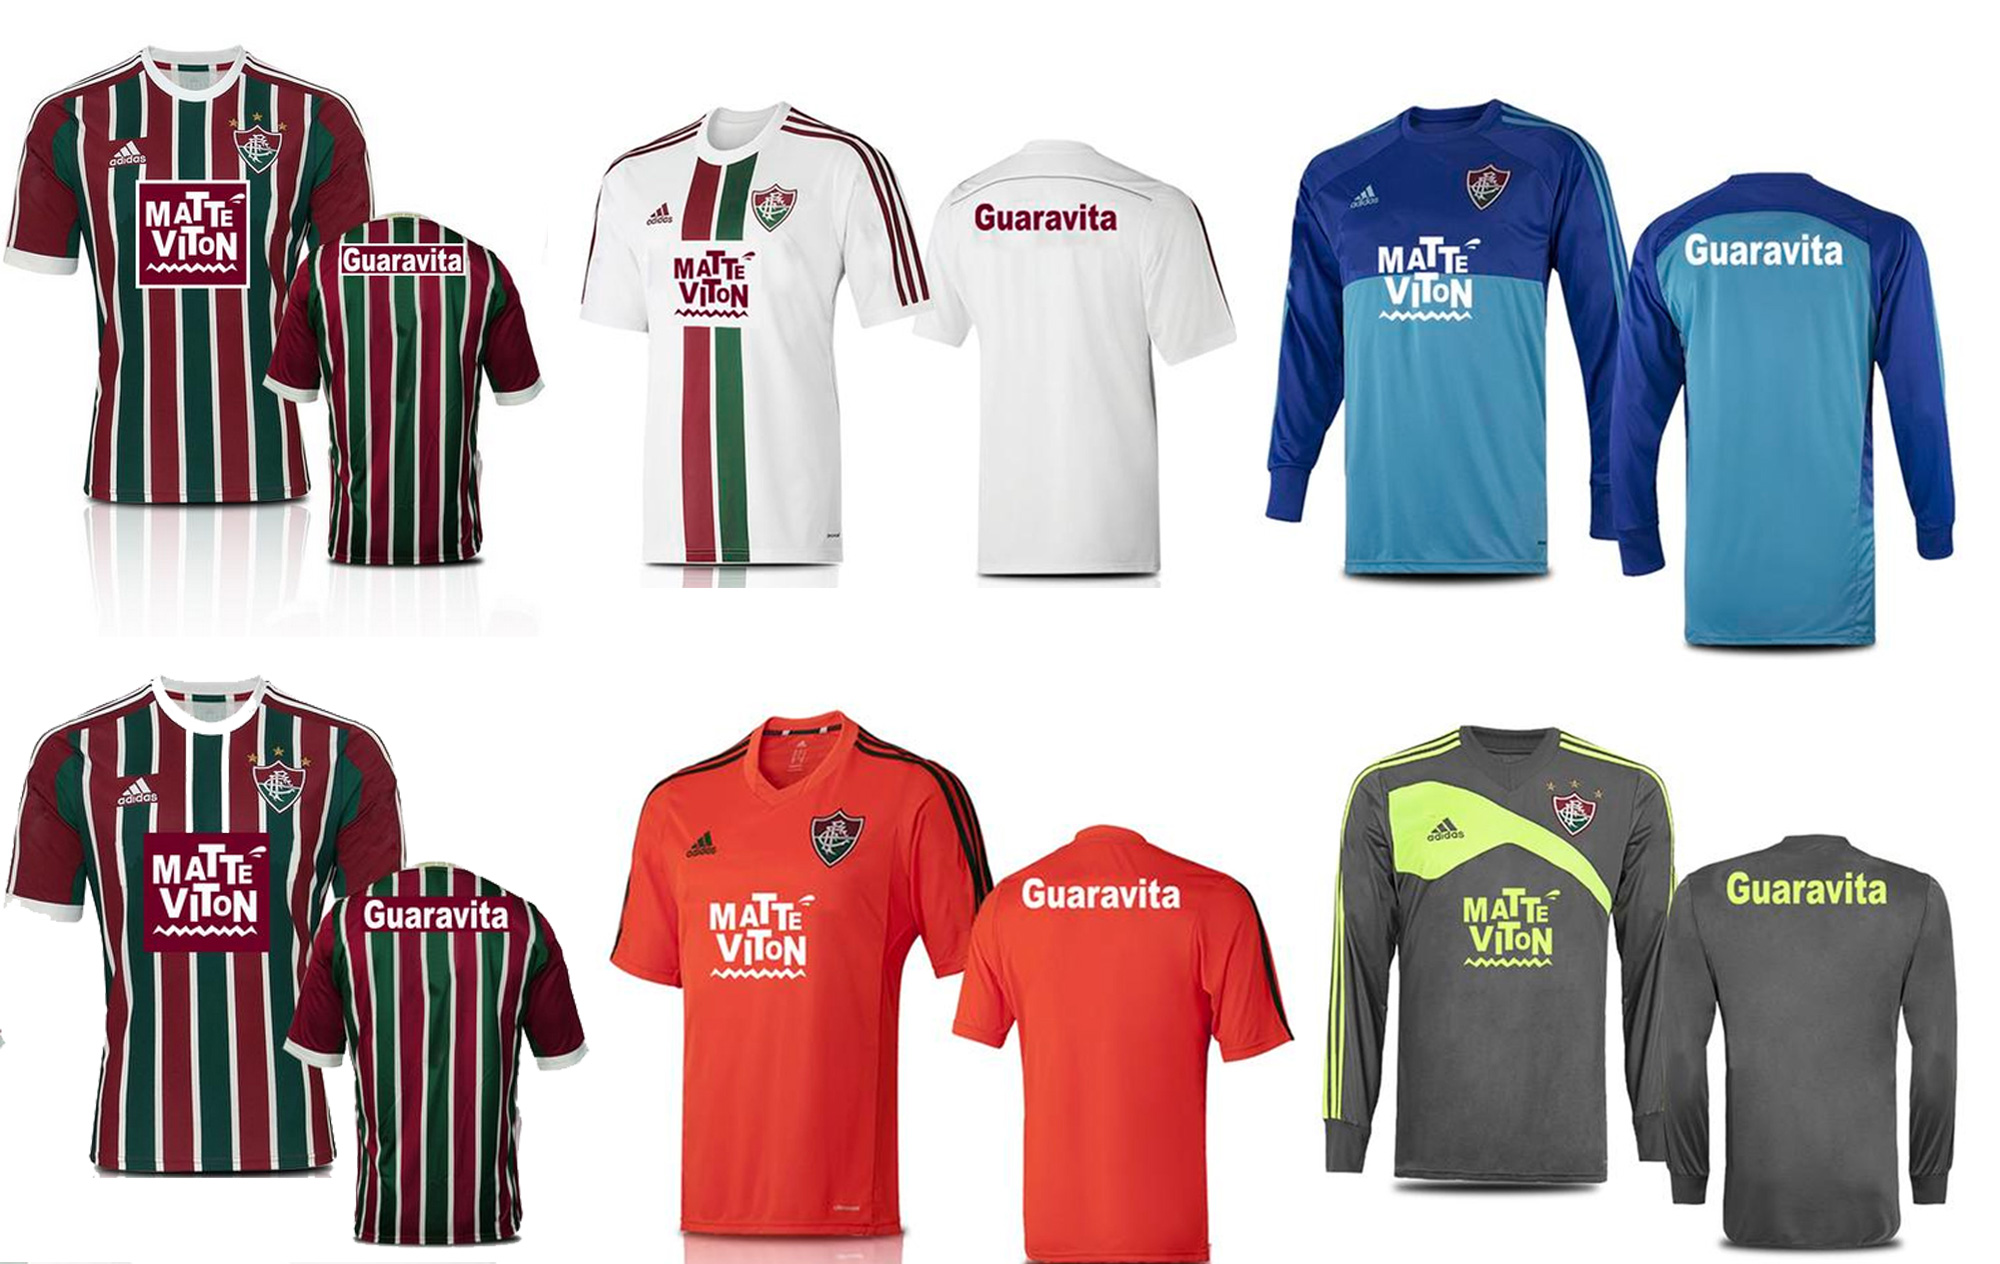 Fluminense divulga uniformes com a marca do novo patrocinador master ... 5199cc2c9adba